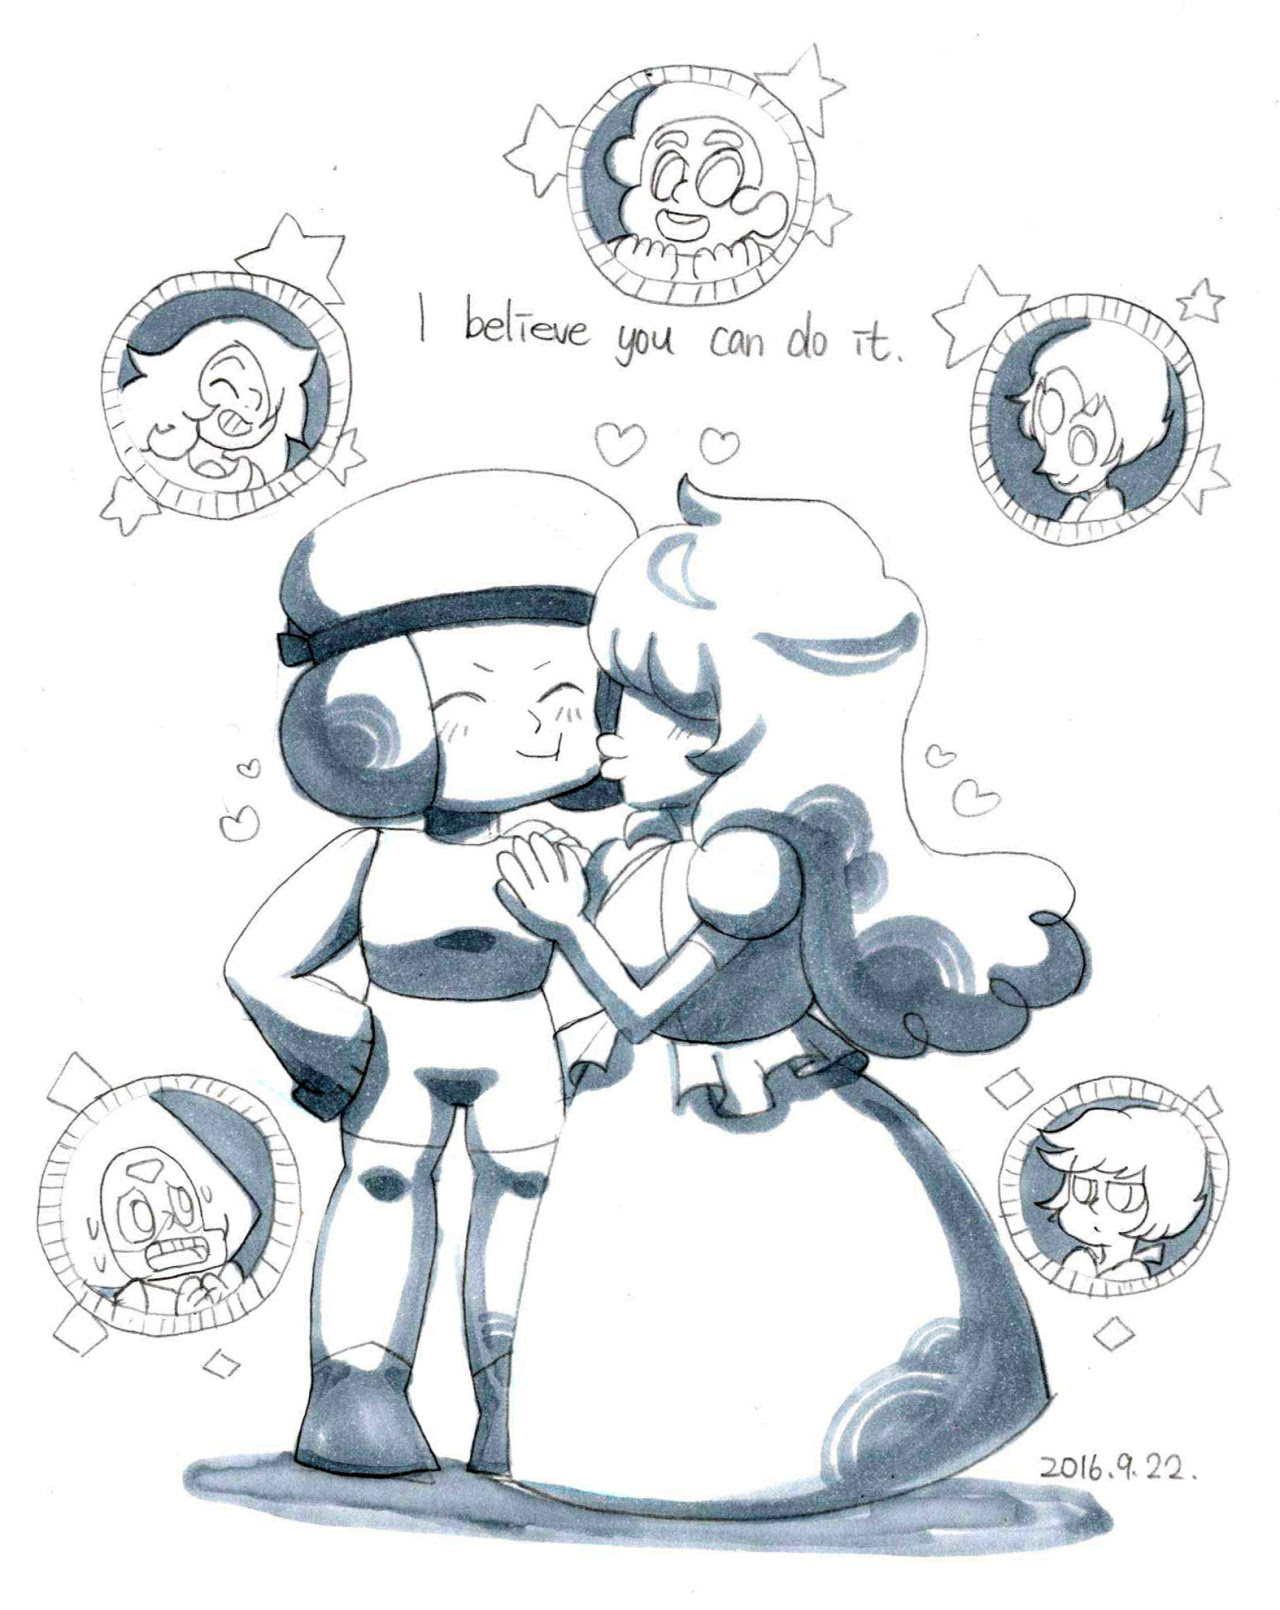 Steven Universe - Doodle Try to find what kind of the style when I draw SU. 畫了喜歡的橋段,Connie好像是第一次畫呢;最喜歡的是Rose媽咪那張的氣氛,雖然微笑的時候我都會畫眼睛瞇起來的樣子QQRuby and Sapphire就是要放閃下~看到Lapis和Peridot好到可以一起跳舞,為他們感到高興~